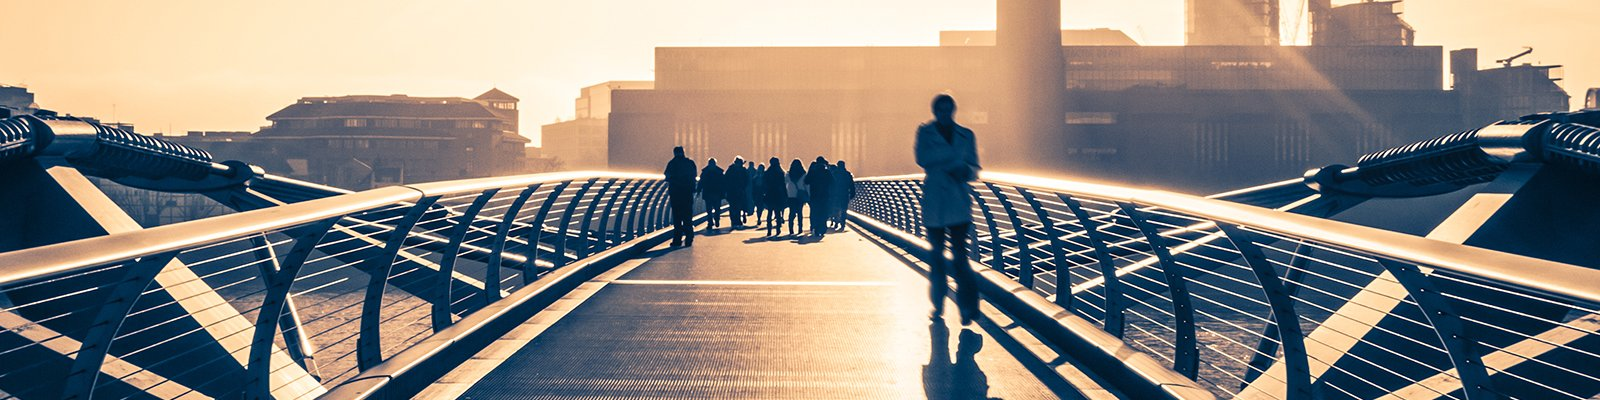 Pathways to Sustainability